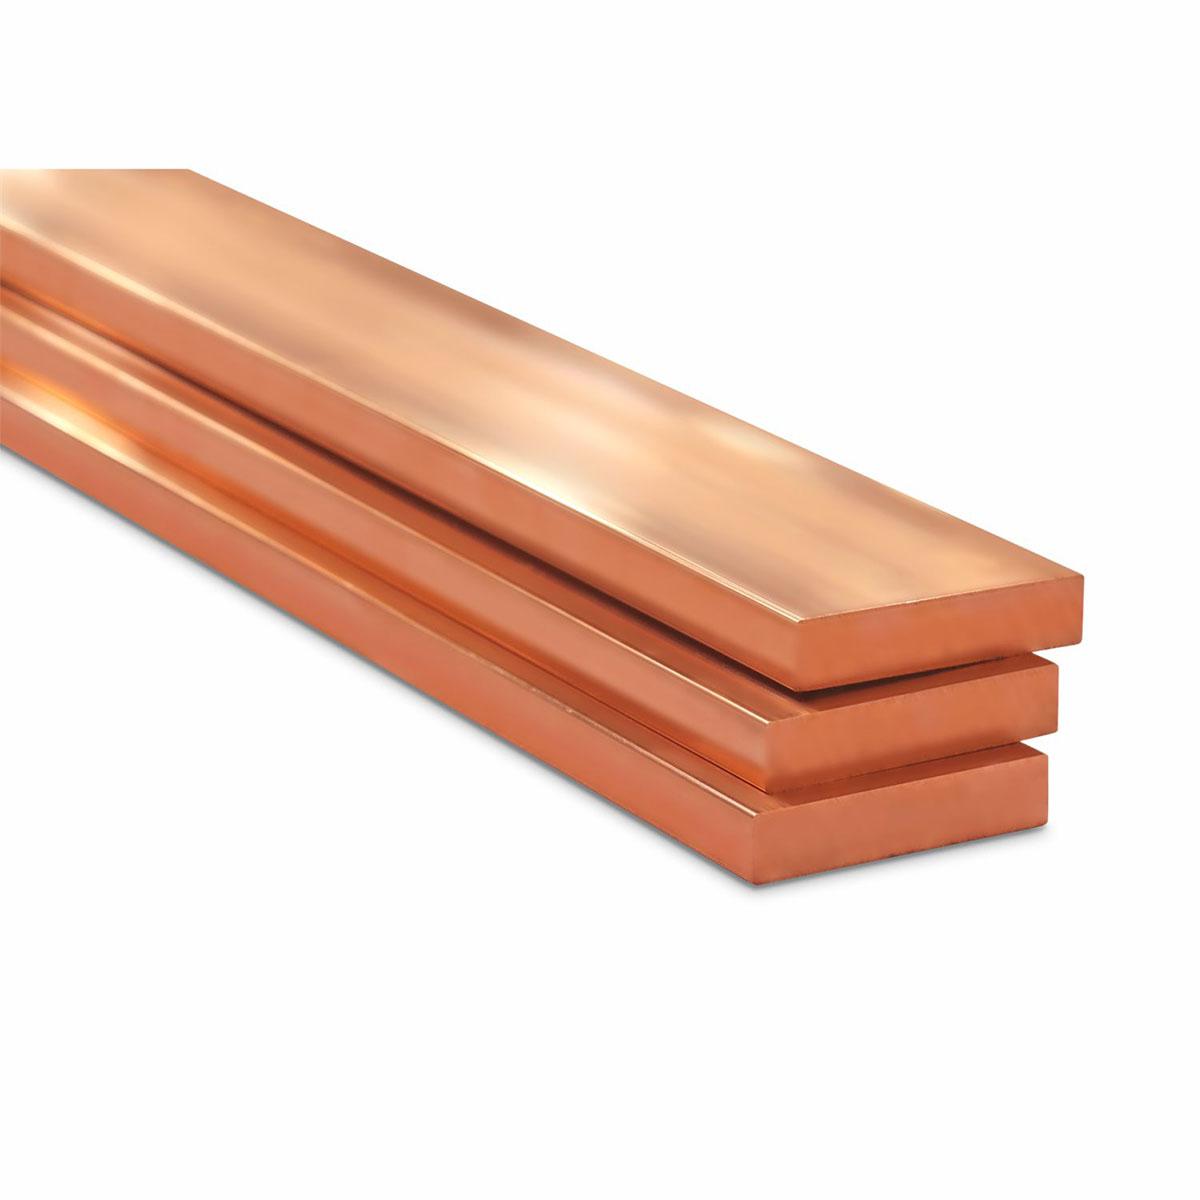 Home - Madhav Copper